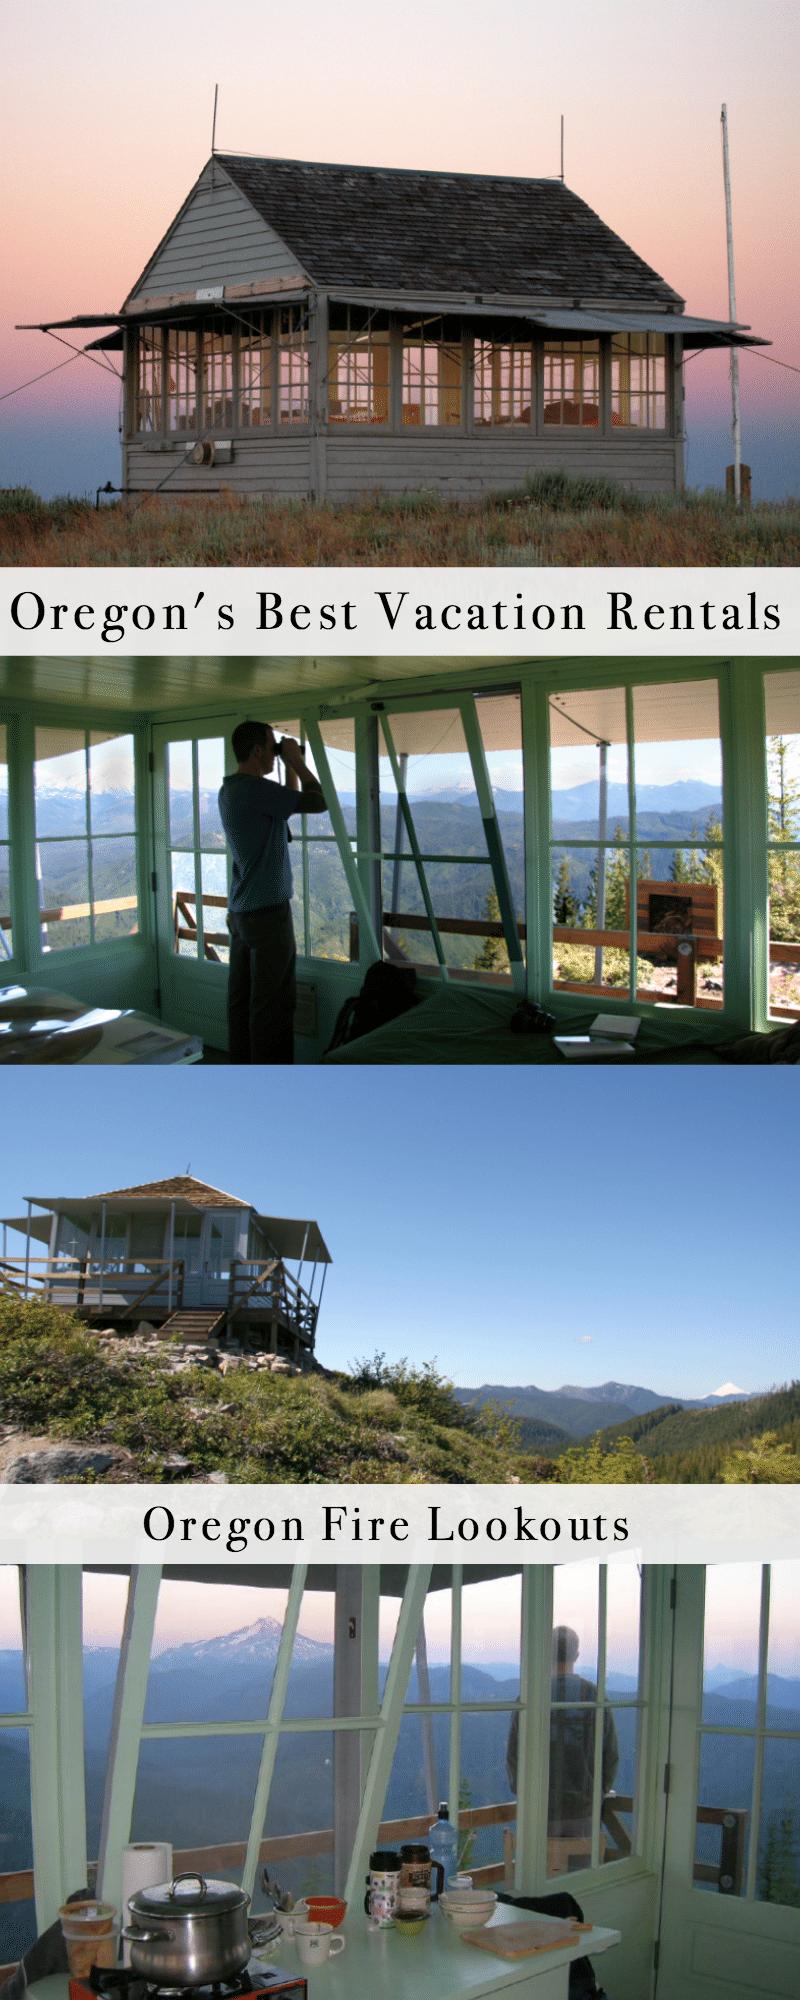 Oregon's Best Vacation Rentals: Oregon Fire Lookouts